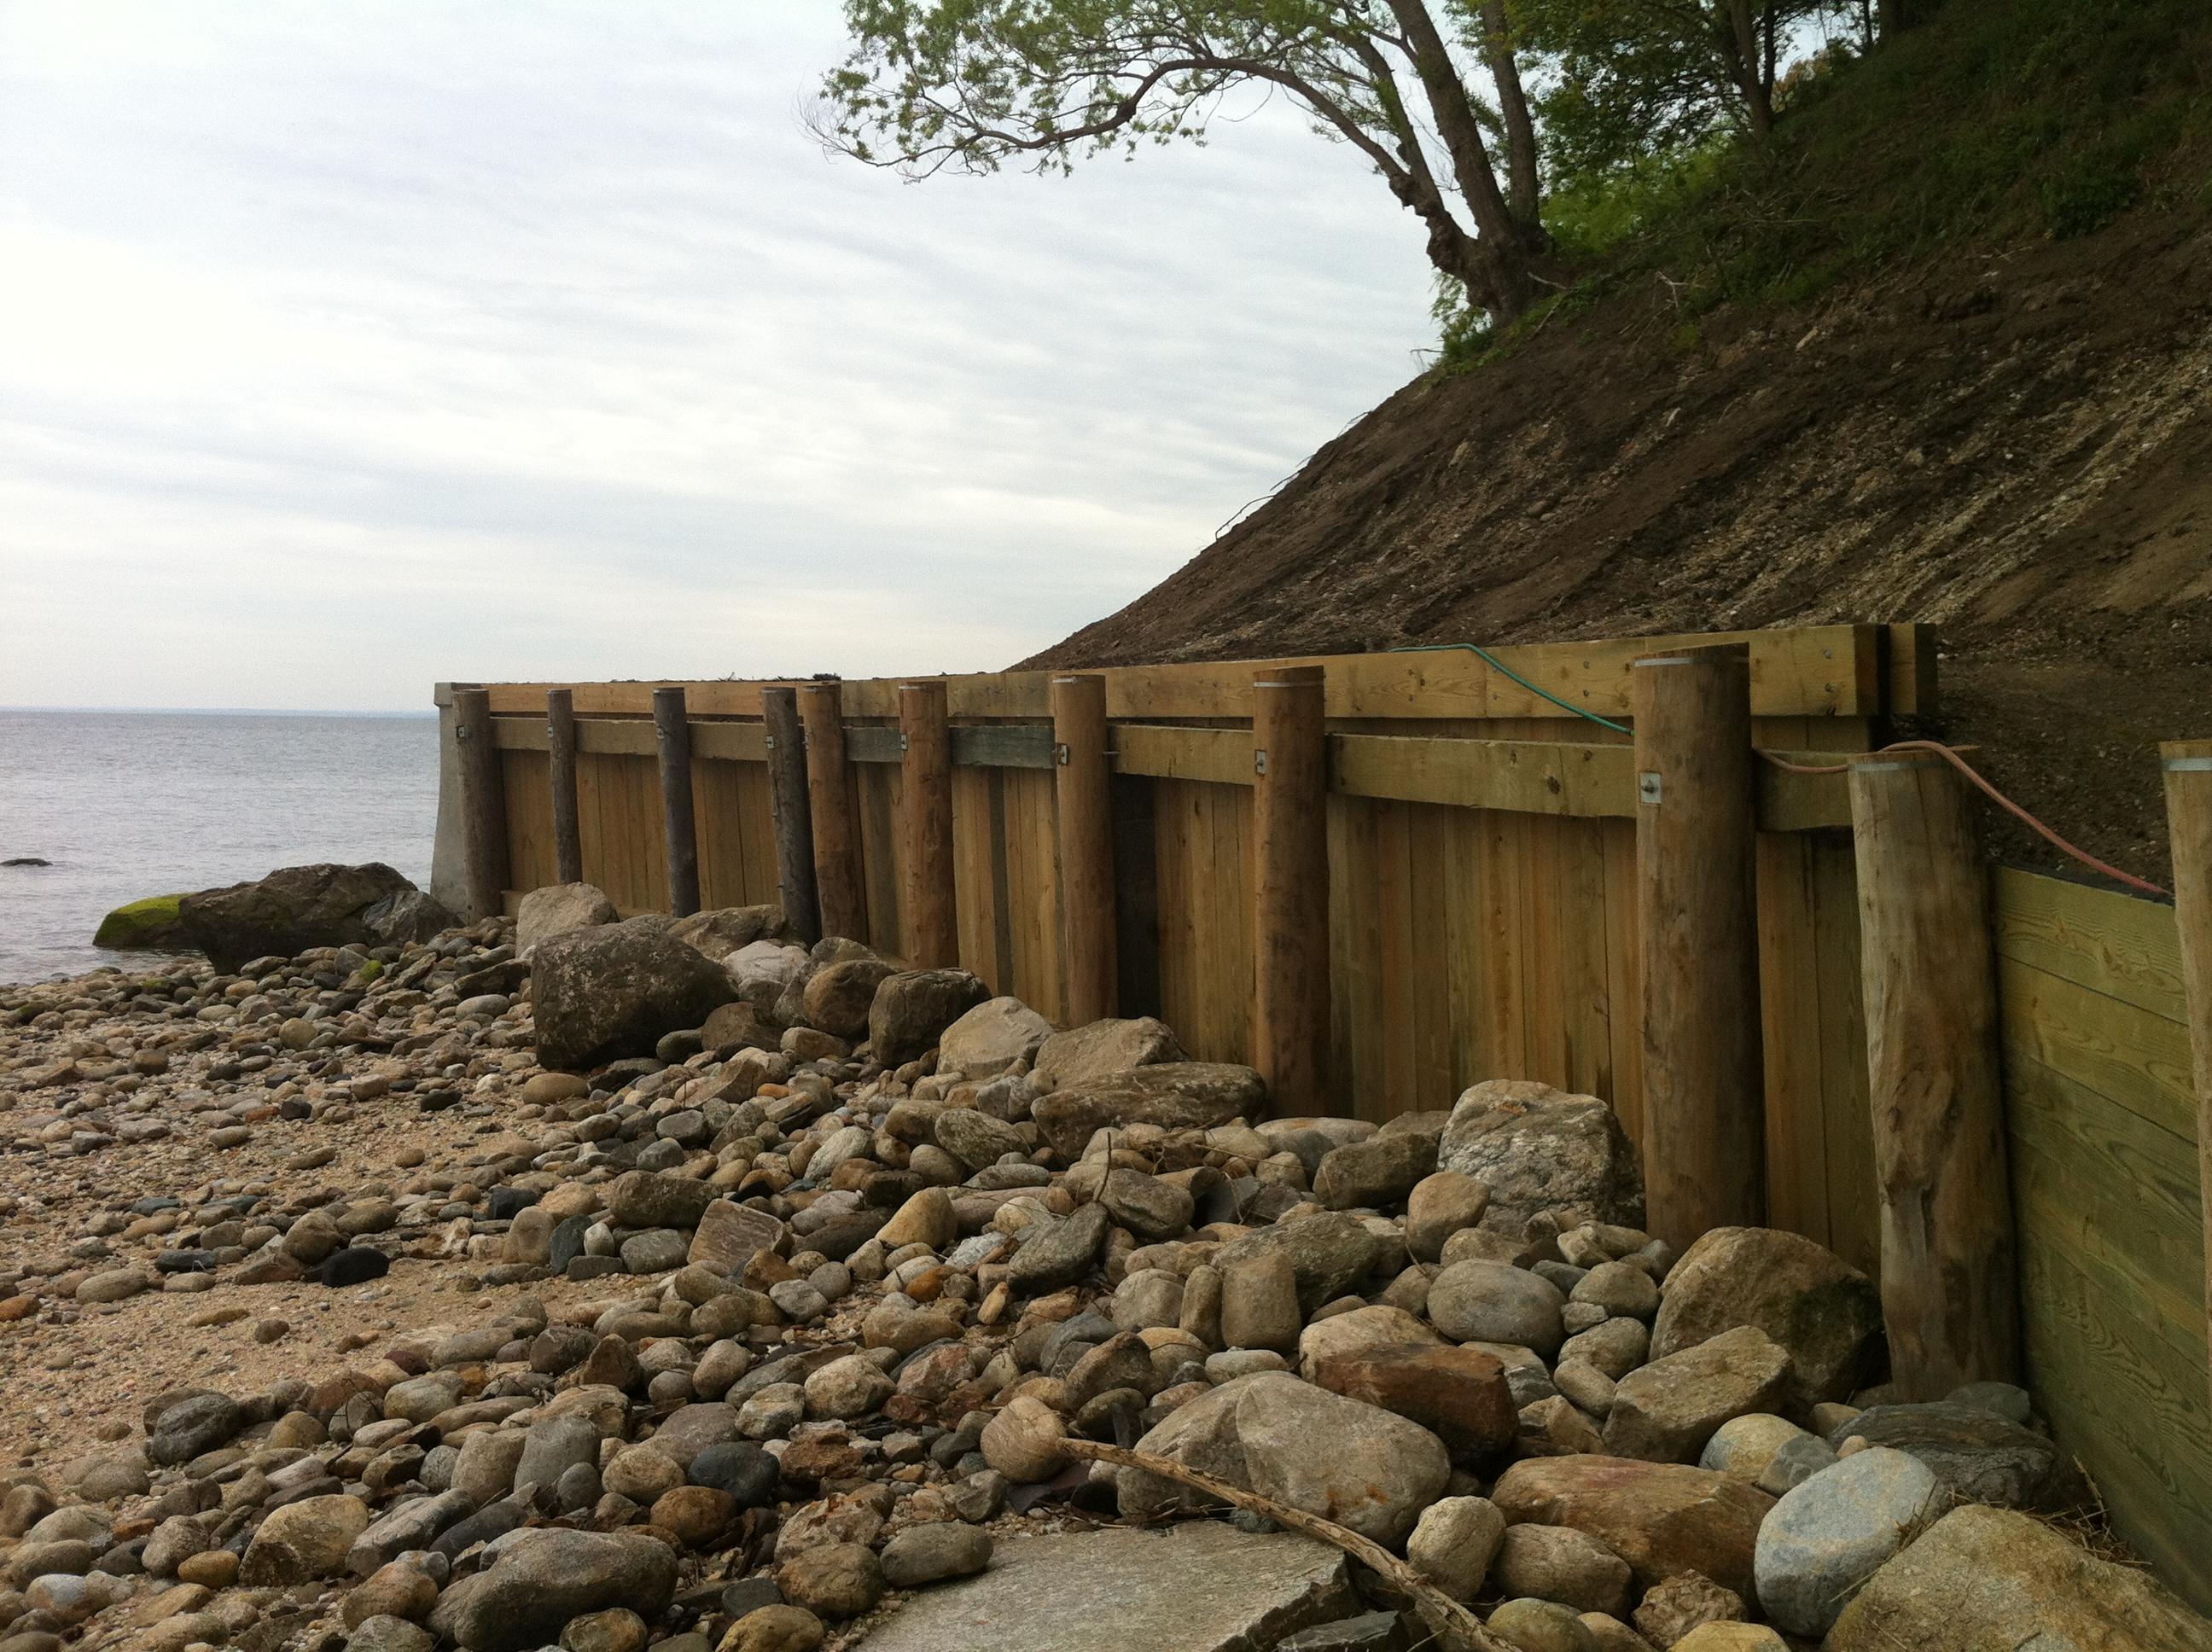 Timber Navy Wall